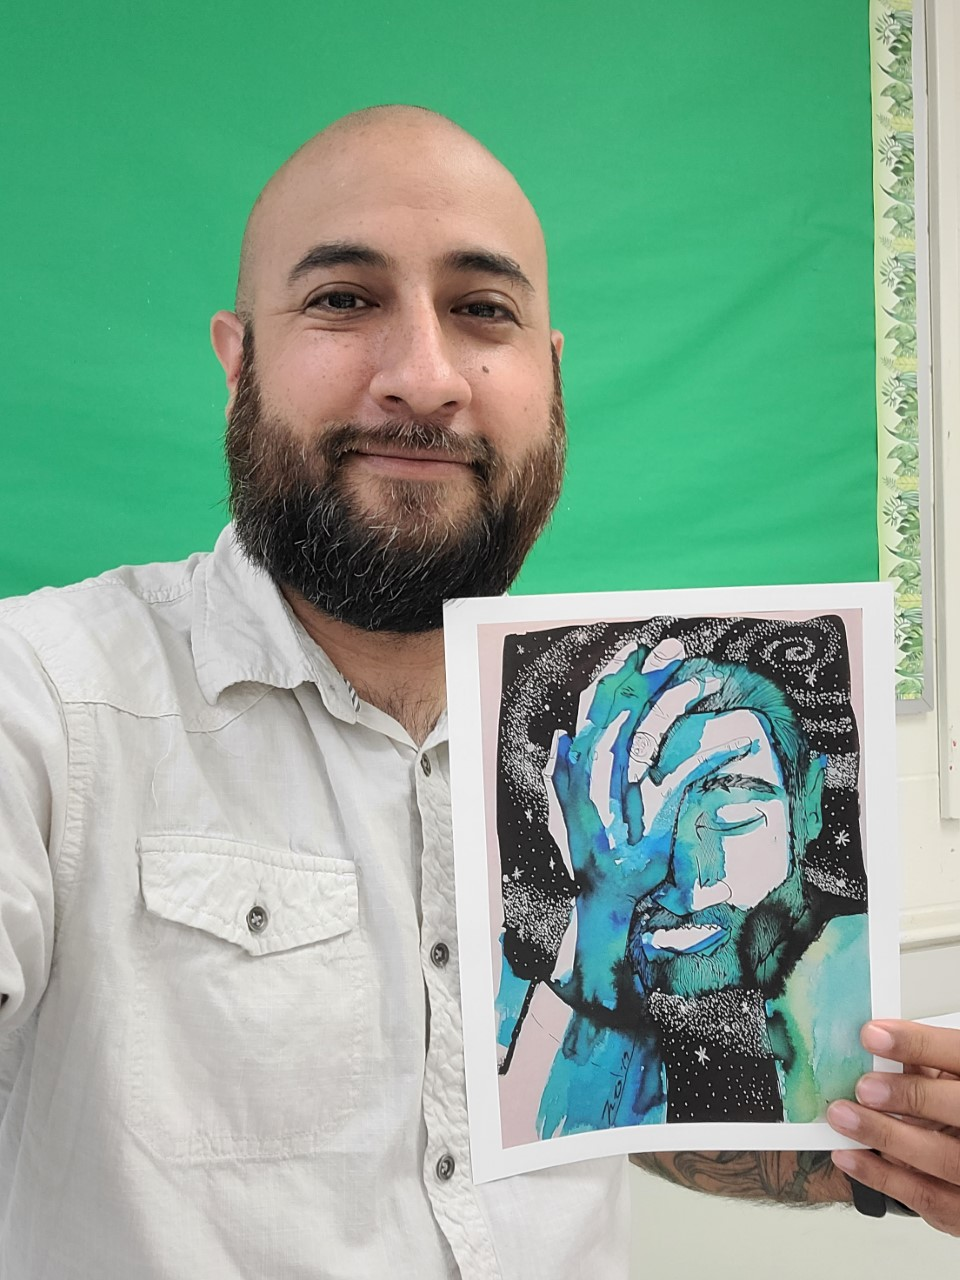 HCISD art teacher wins third place in Texas Mental Health Creative Arts Contest